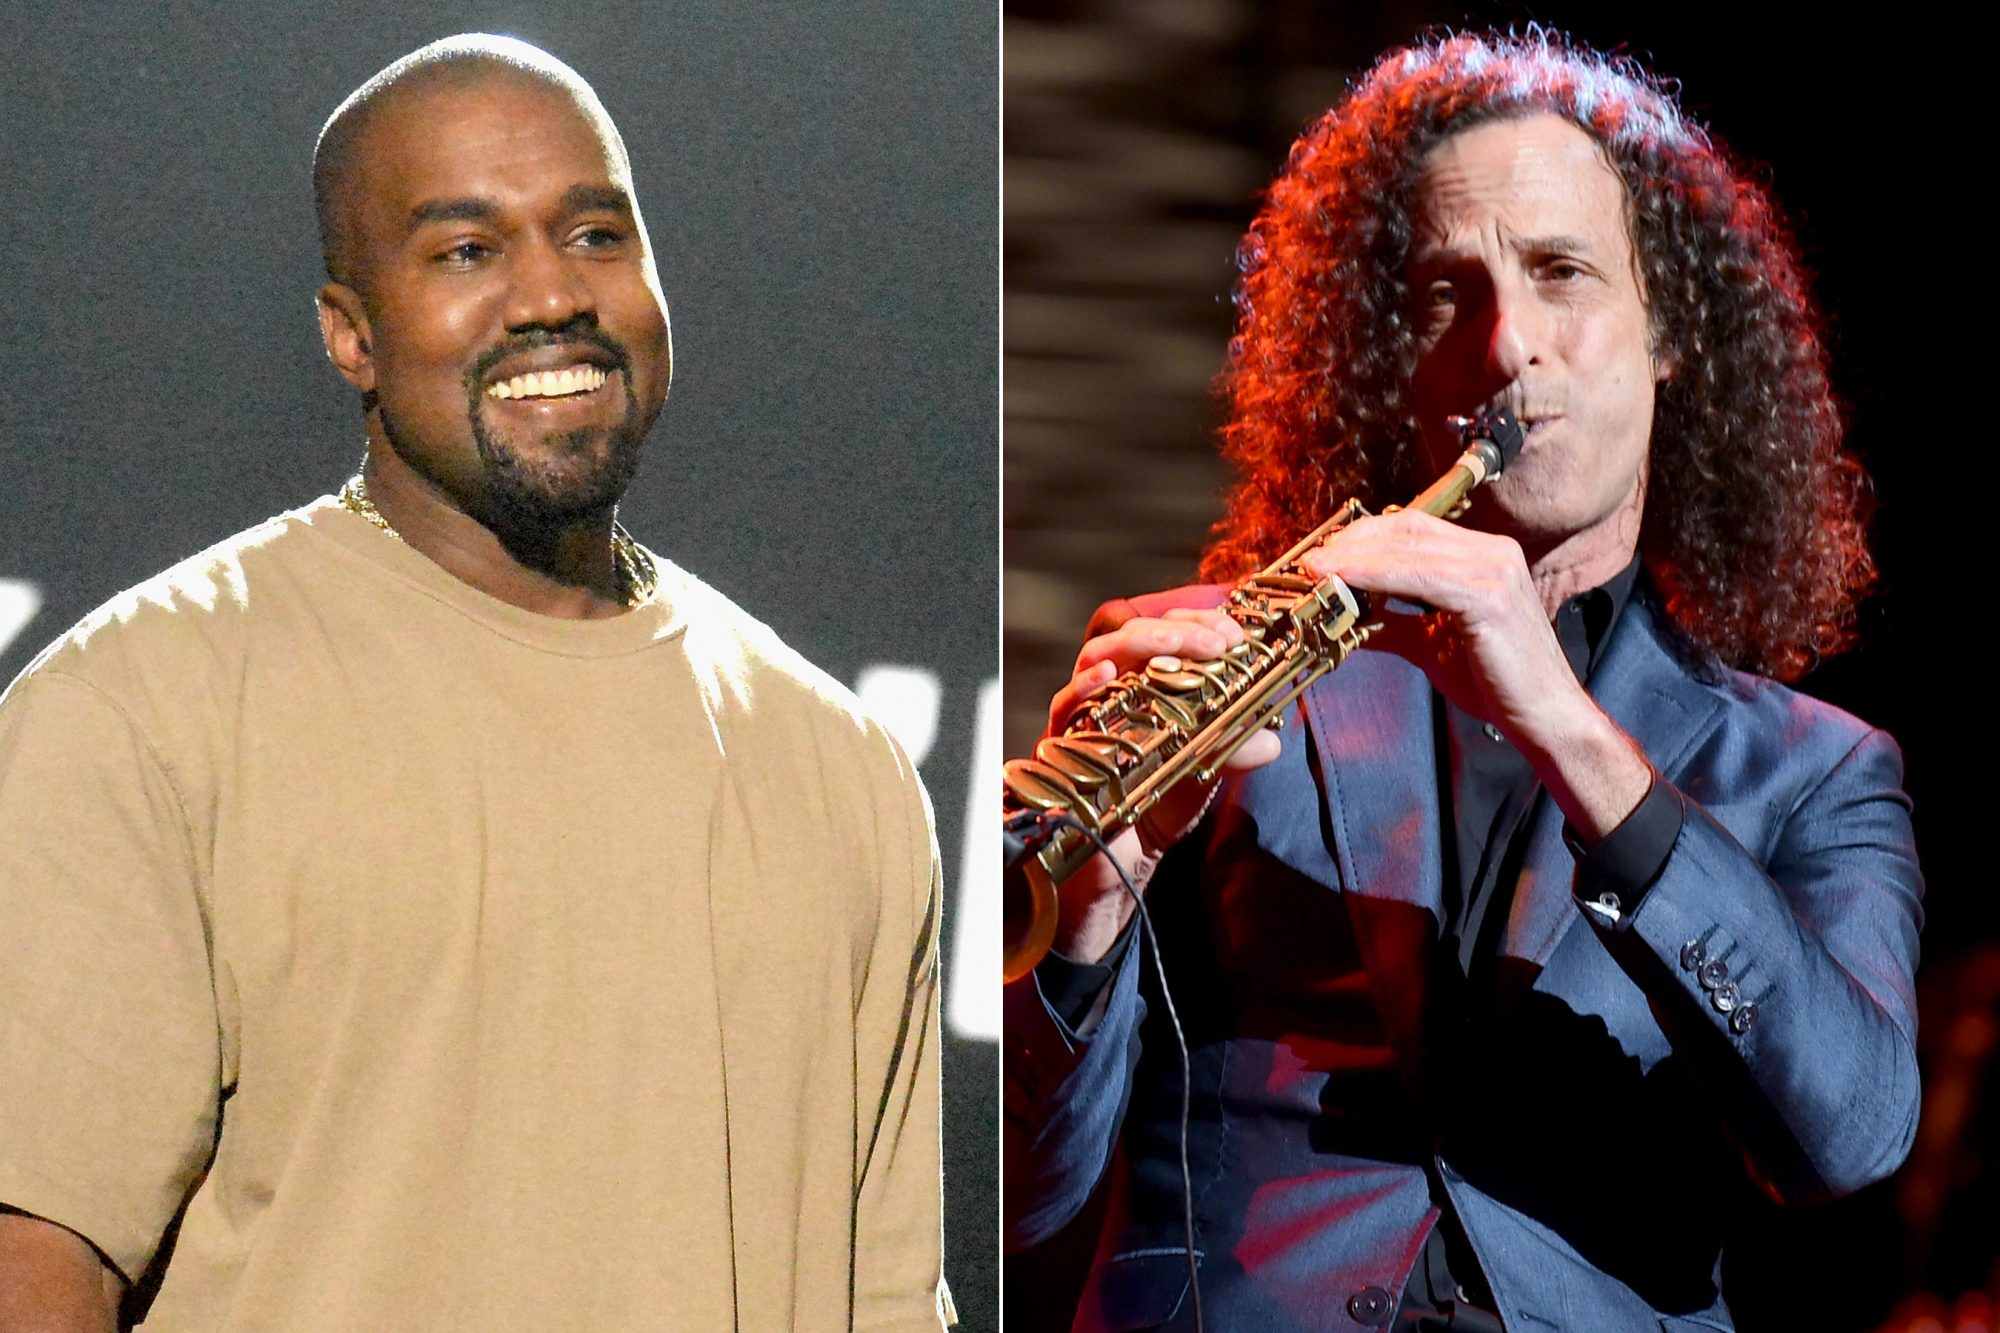 Kanye West / Kenny G